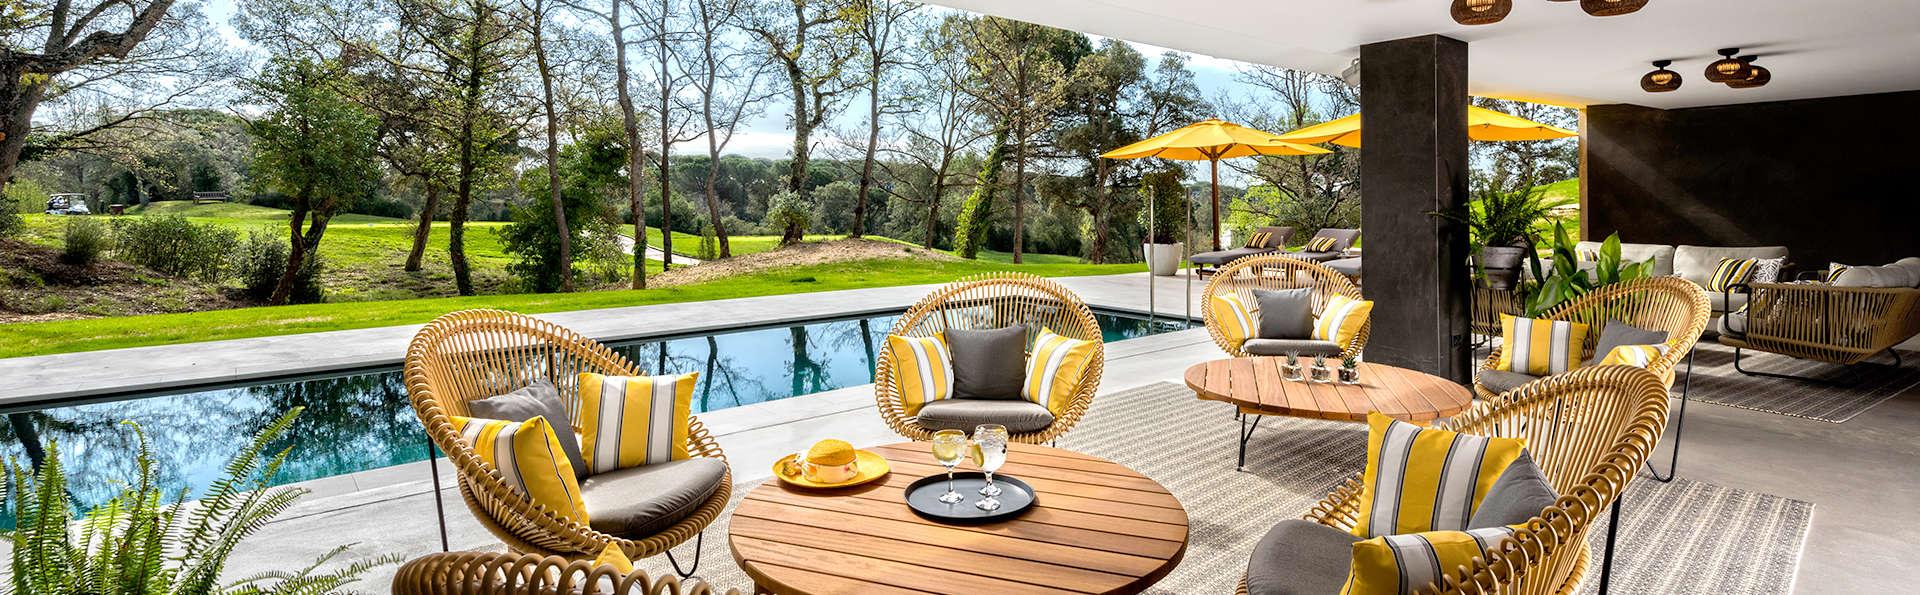 Excusif: Chambre avec vue sur un grand terrain de golf et Vermouth